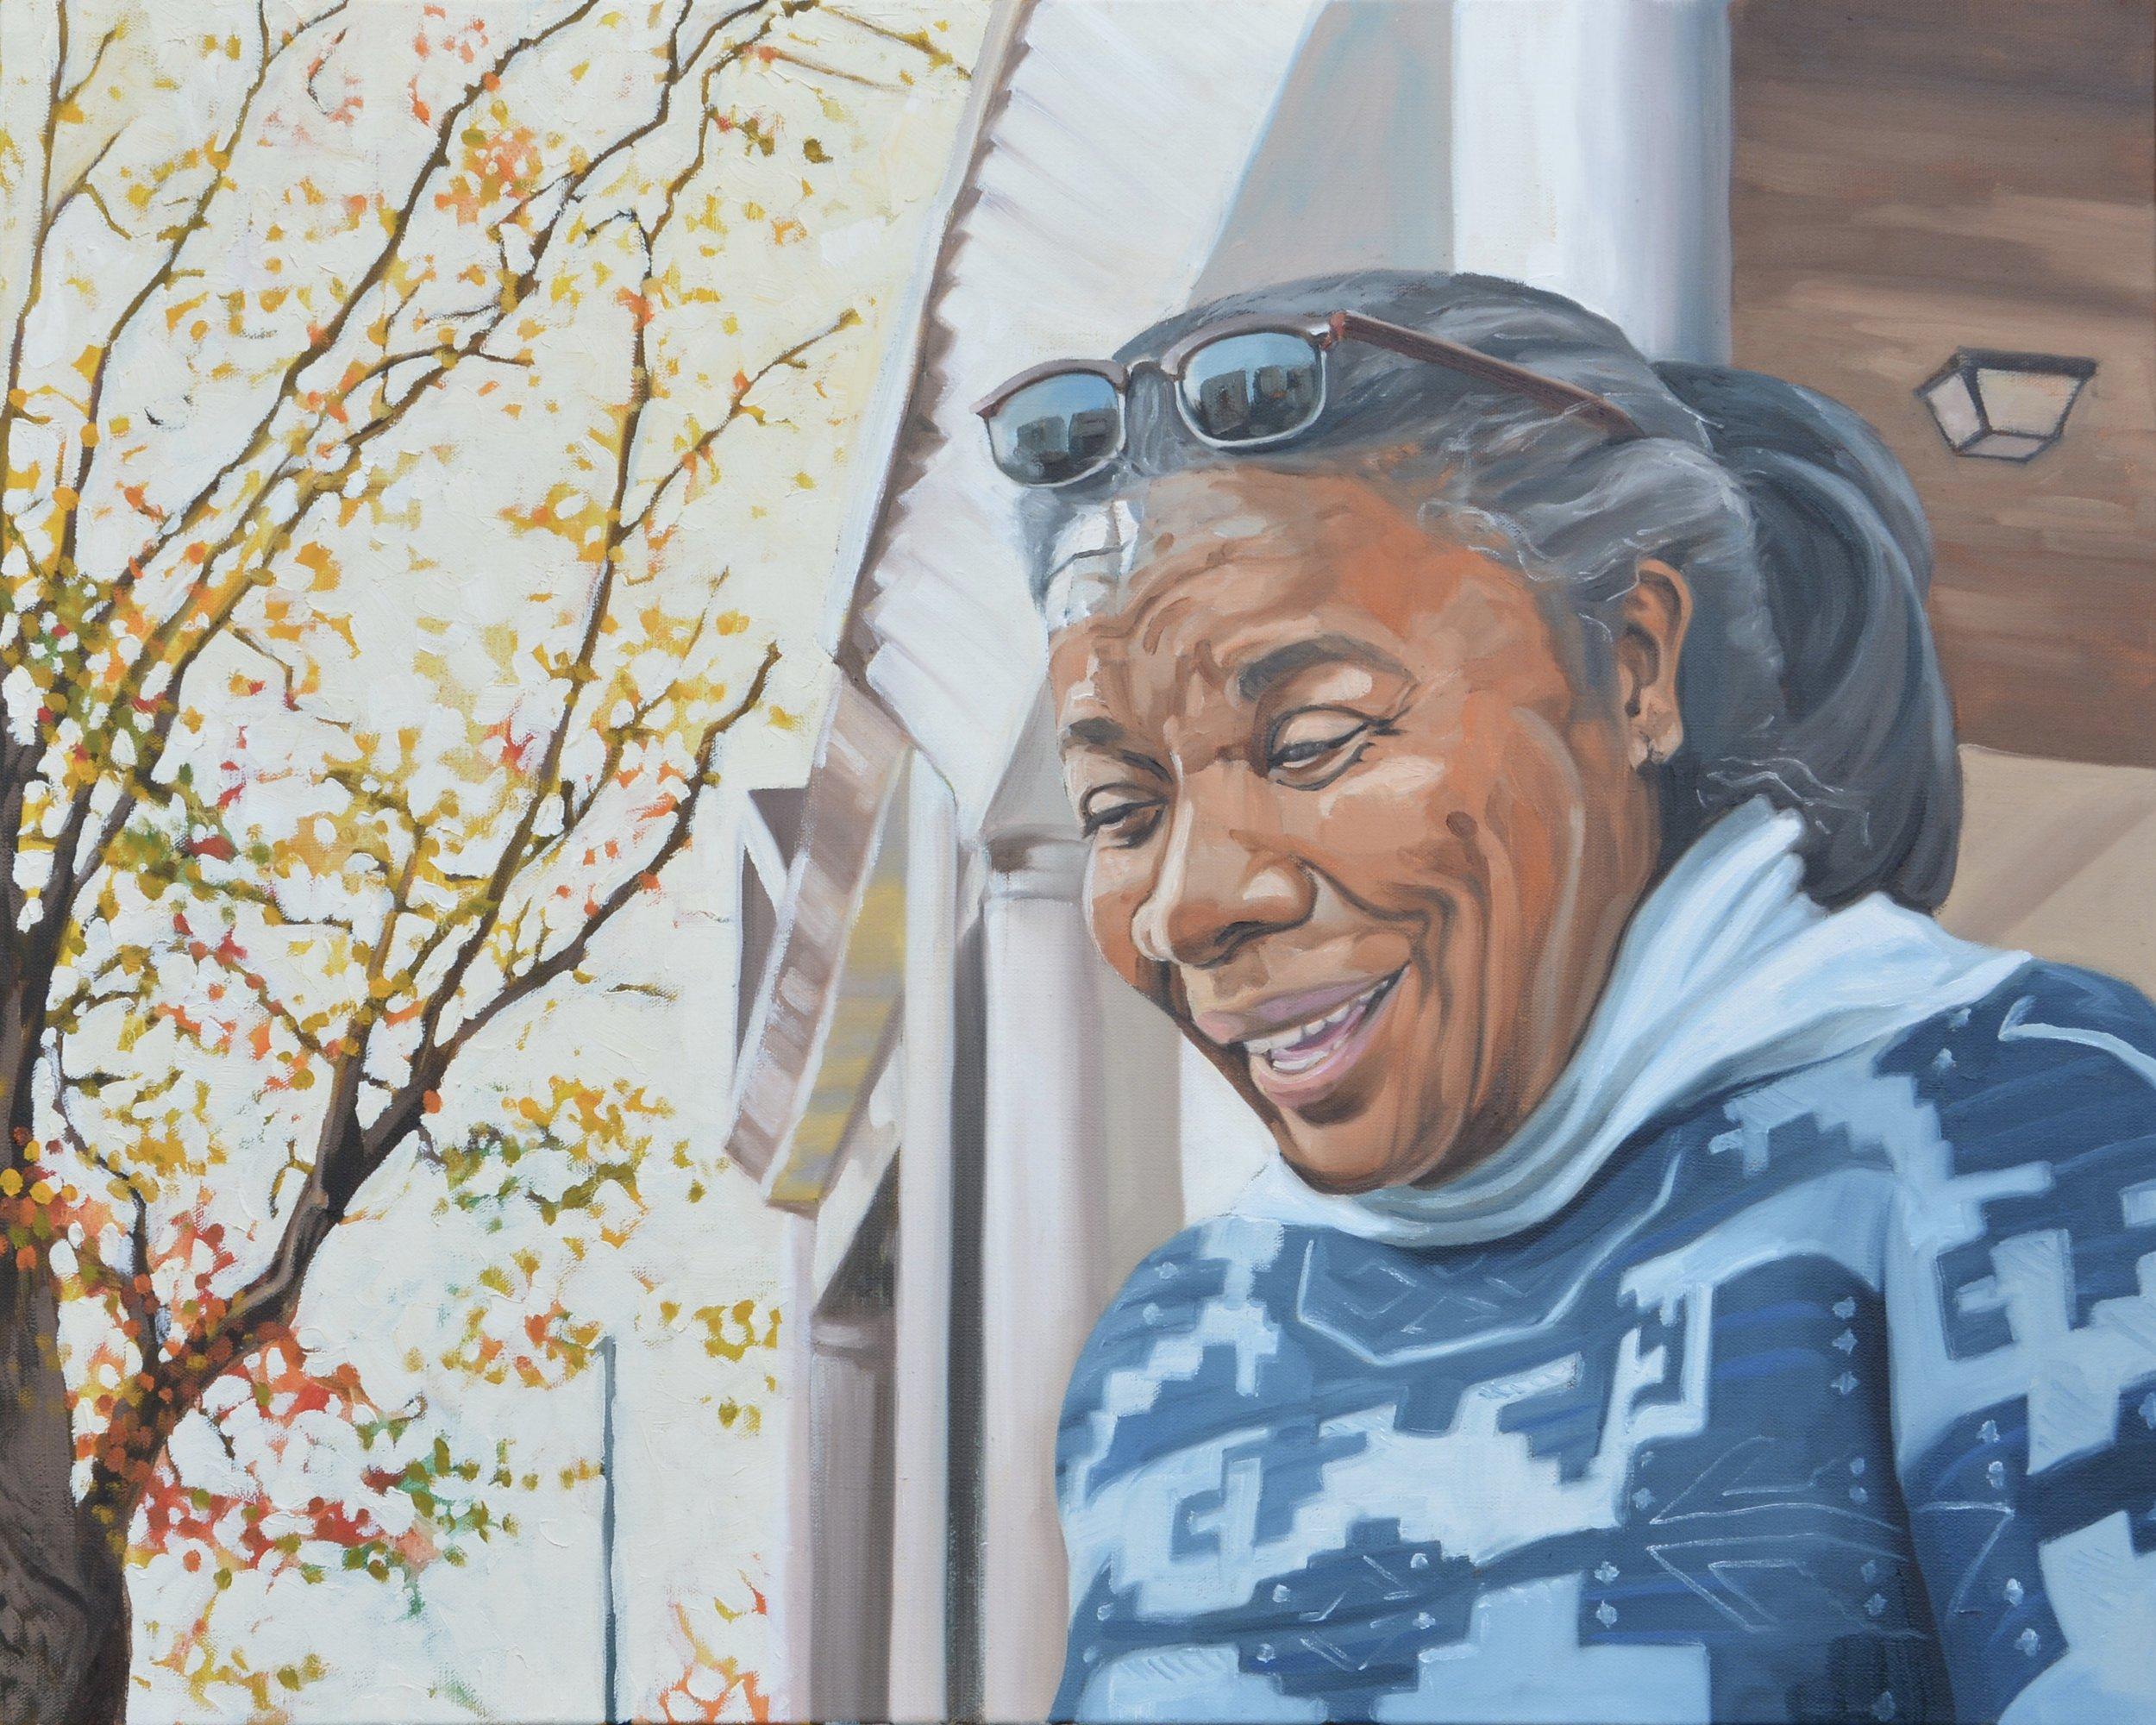 "Copy of Good Neighbors (Gina), 24x30"", oil on canvas, 2017"